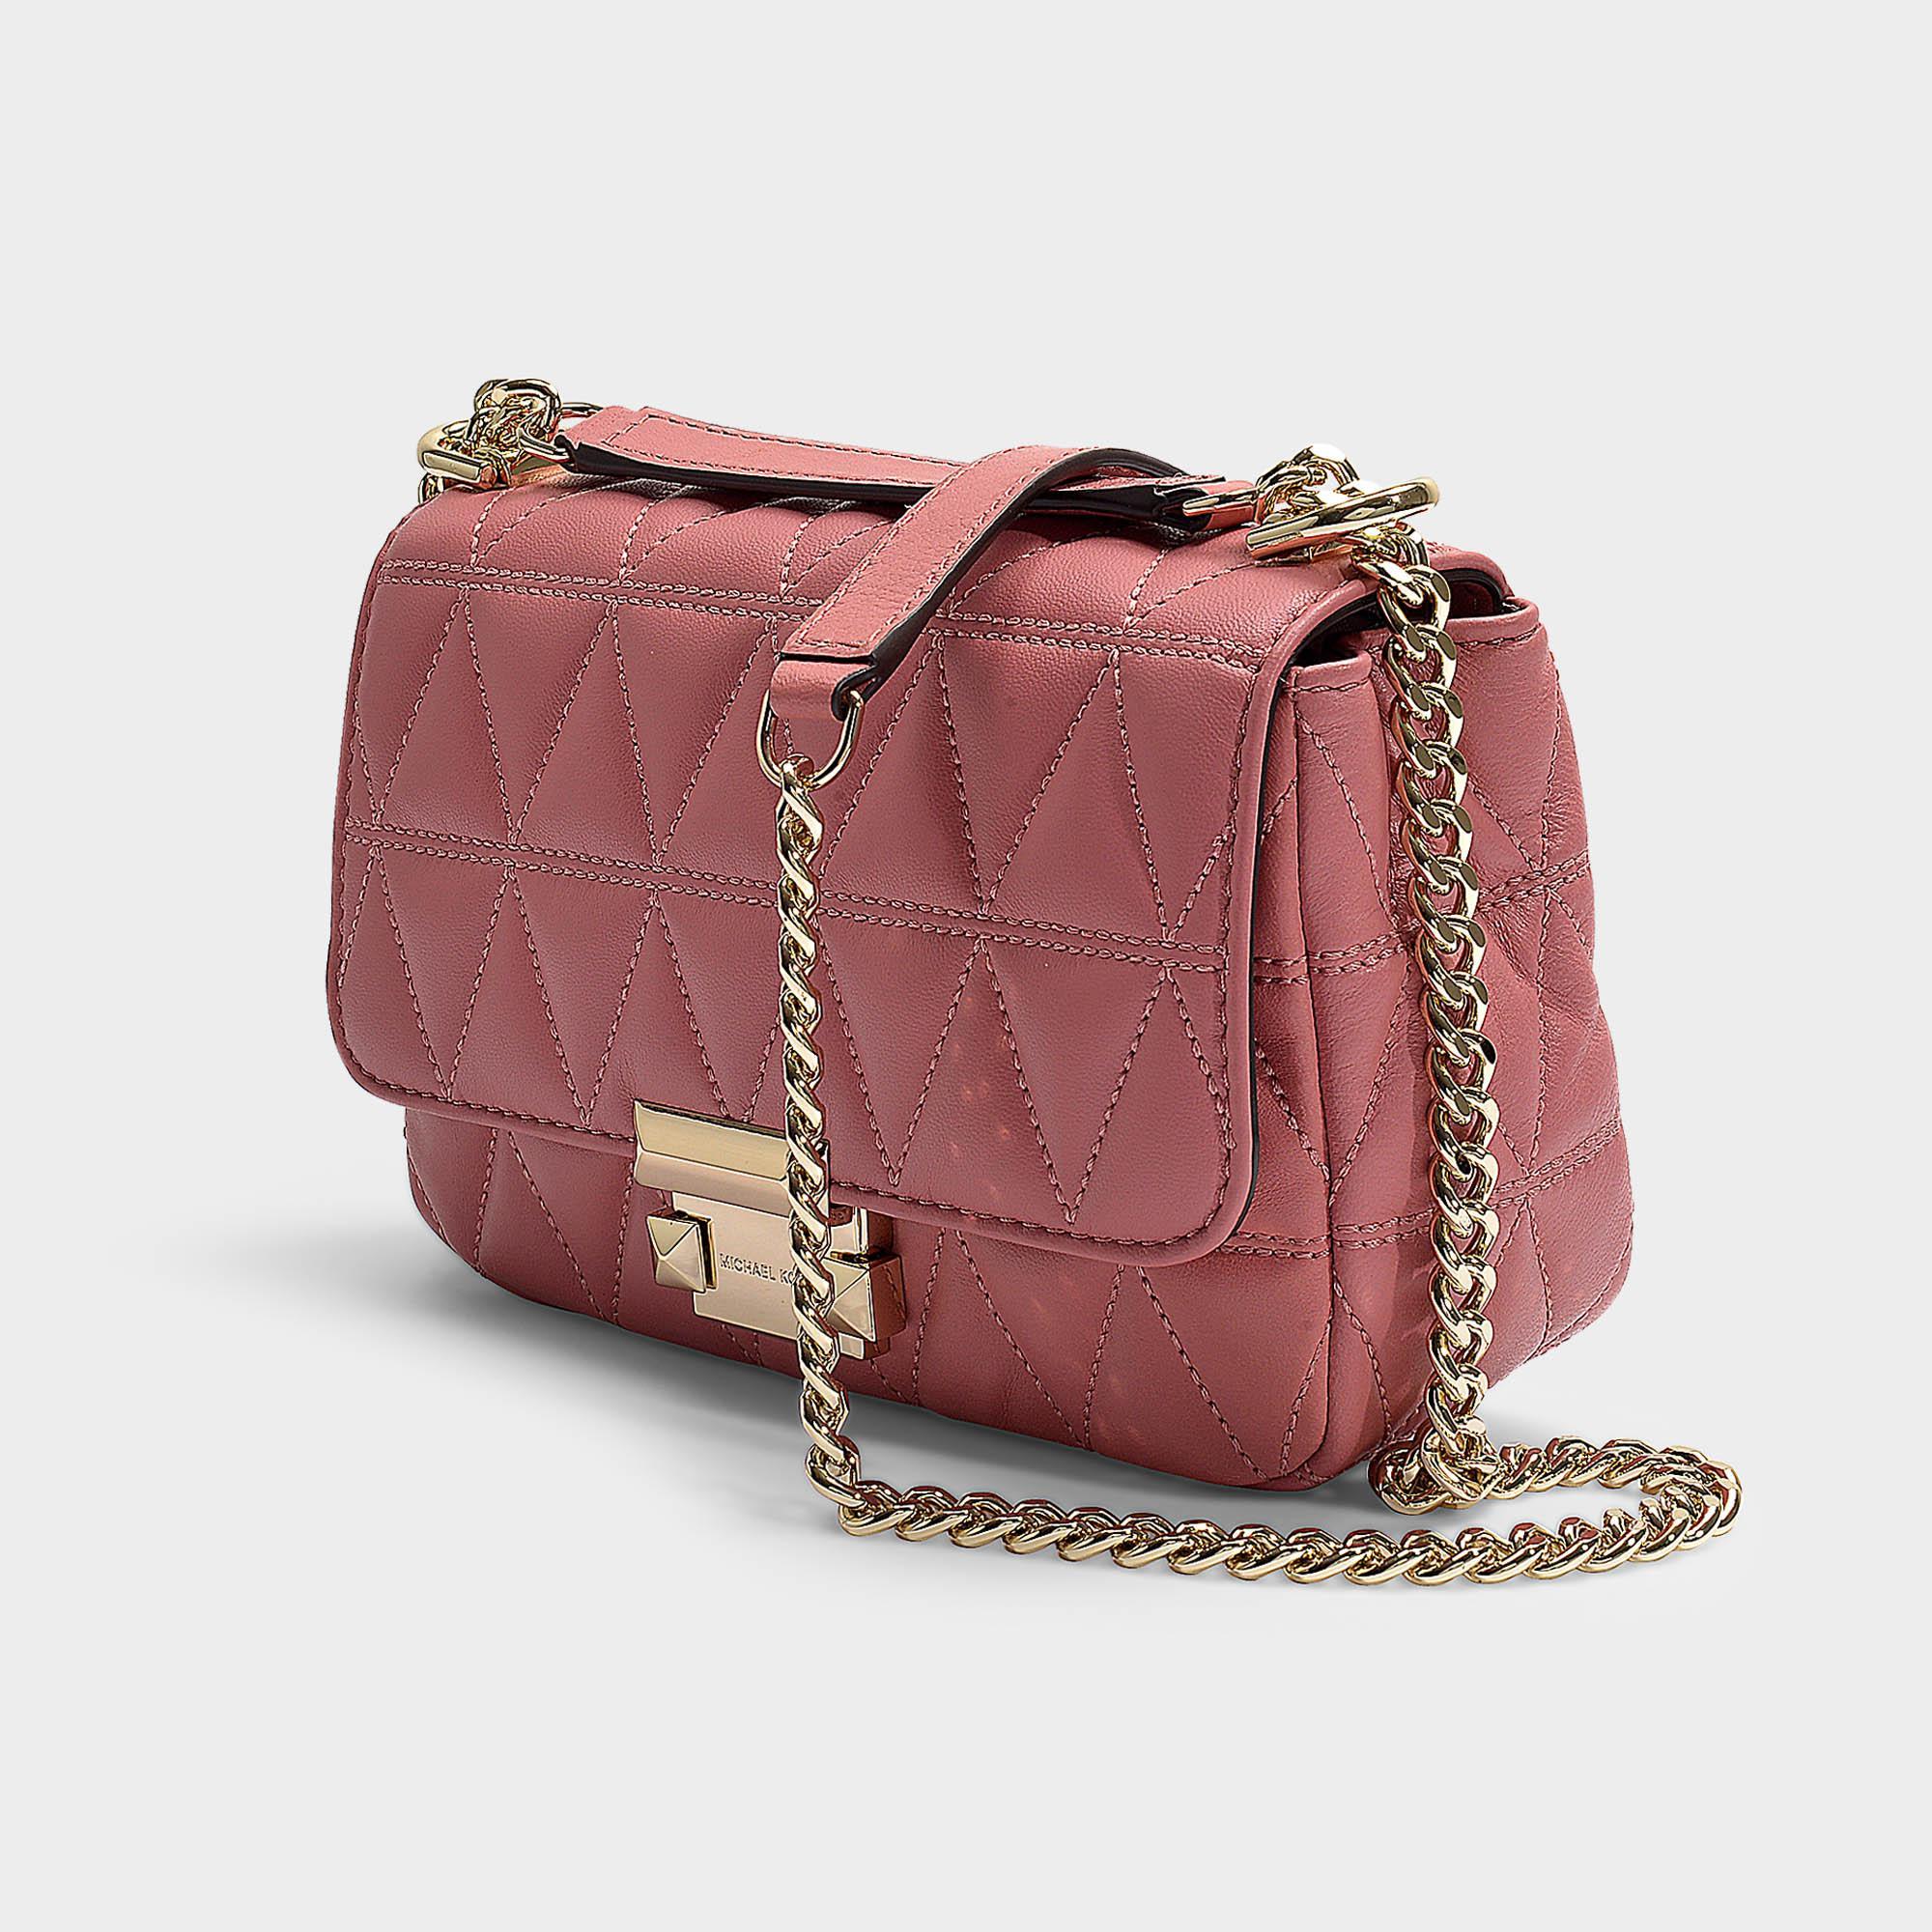 c1d5b3f6f5d MICHAEL Michael Kors - Pink Sloan Small Chain Shoulder Bag In Rose Quilted  Lambskin - Lyst. View fullscreen